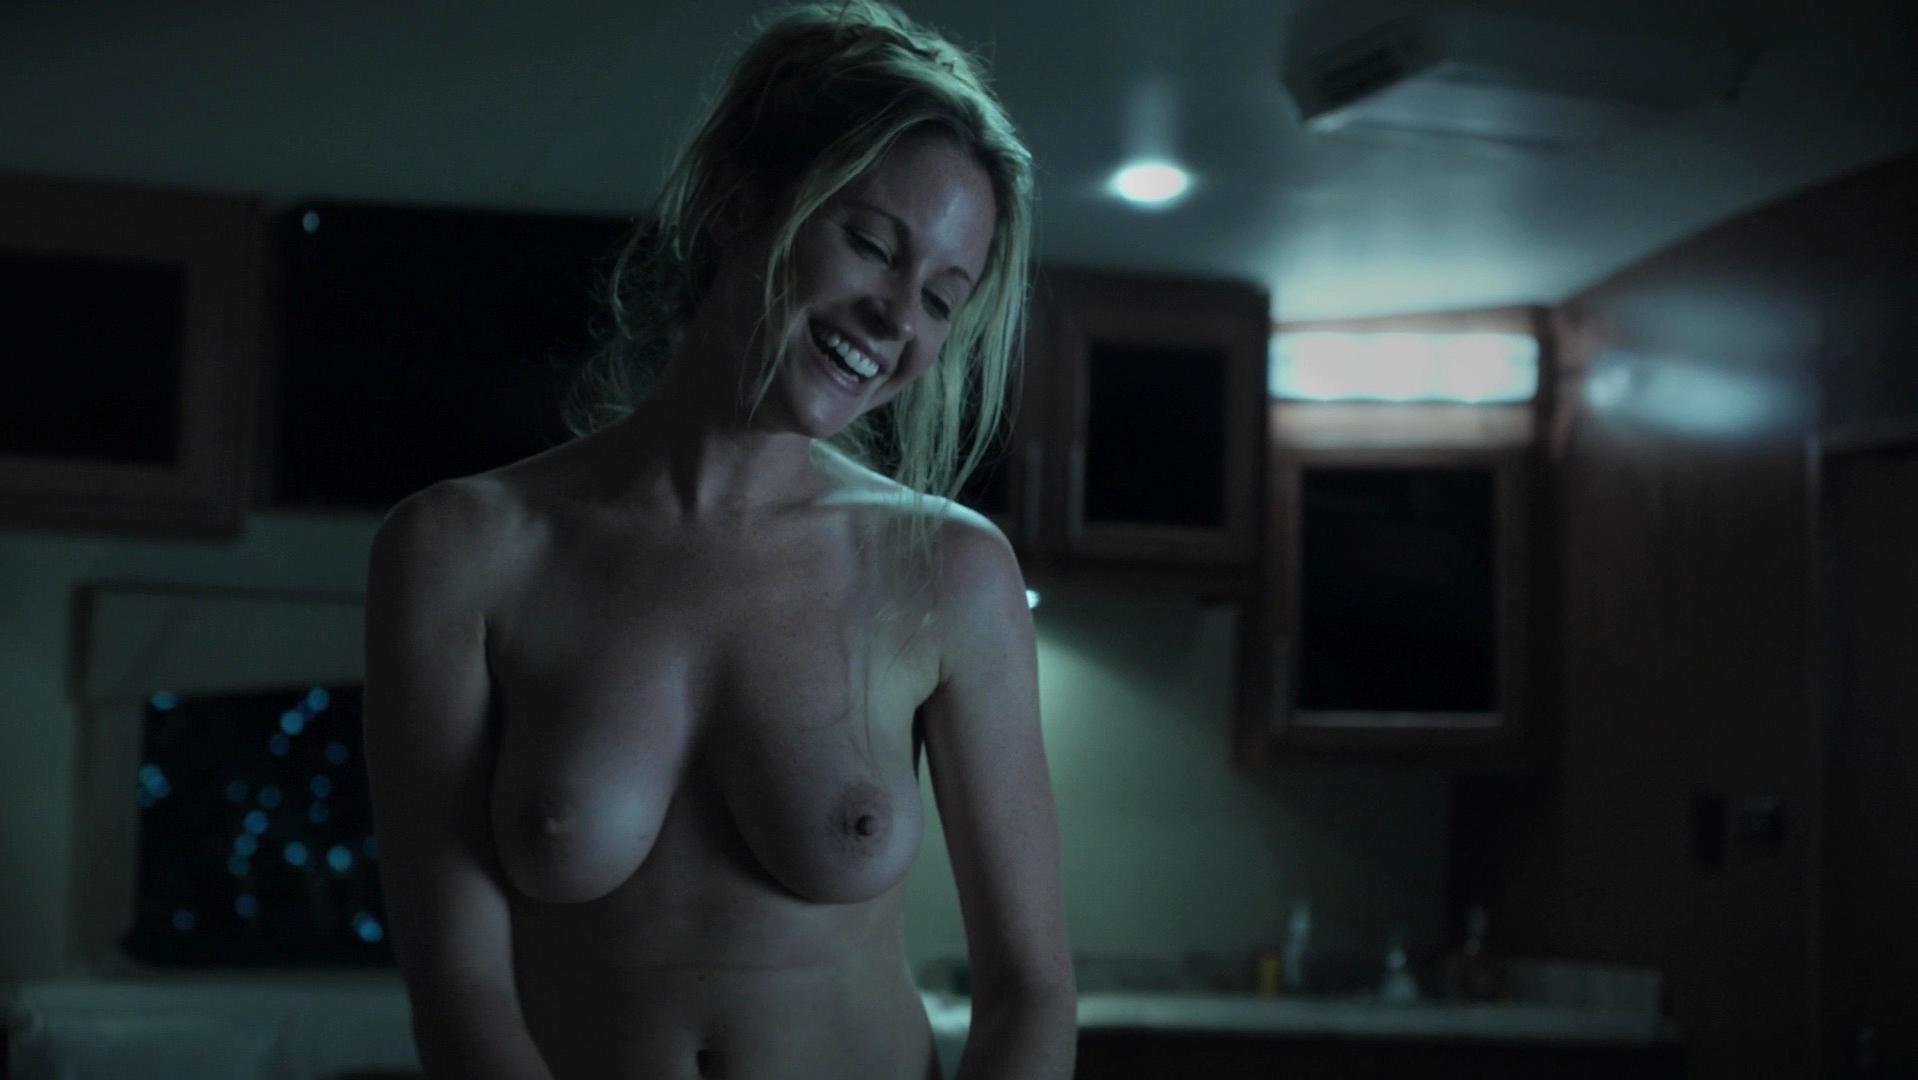 Erin Estelle McQuatters nude, Leslea Fisher nude - Banshee s01e03 (2013)